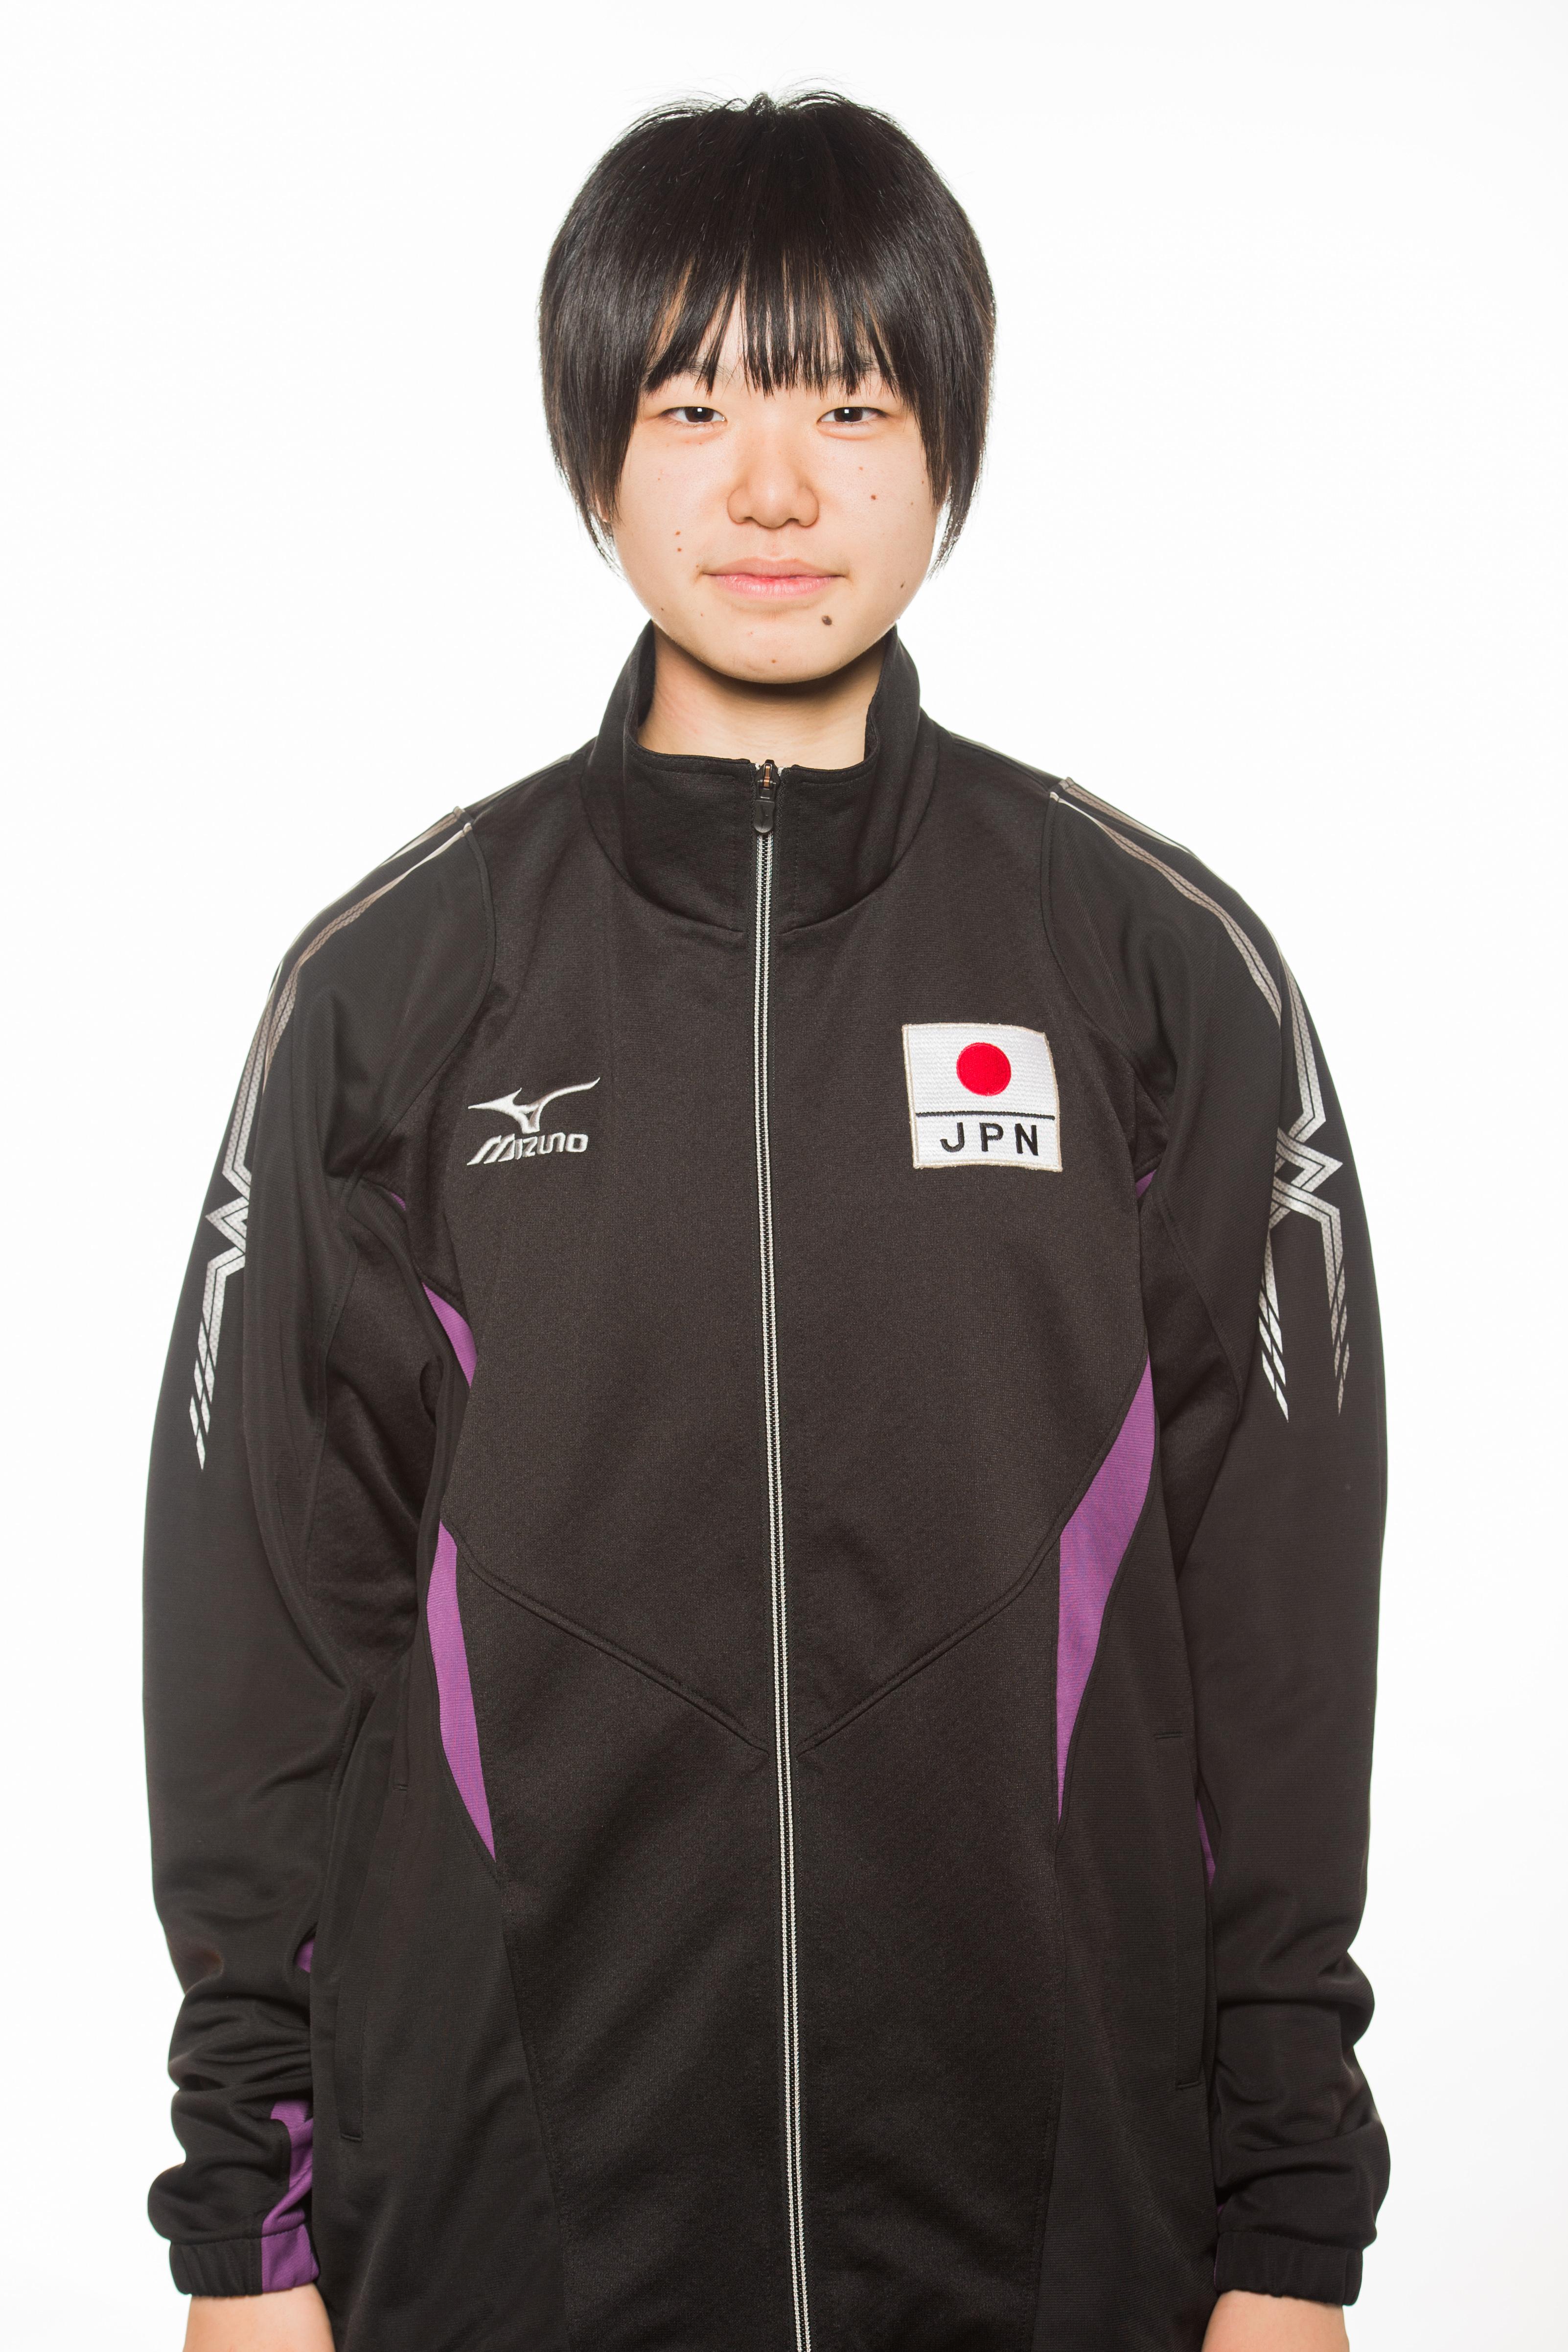 Yuka Kitsui